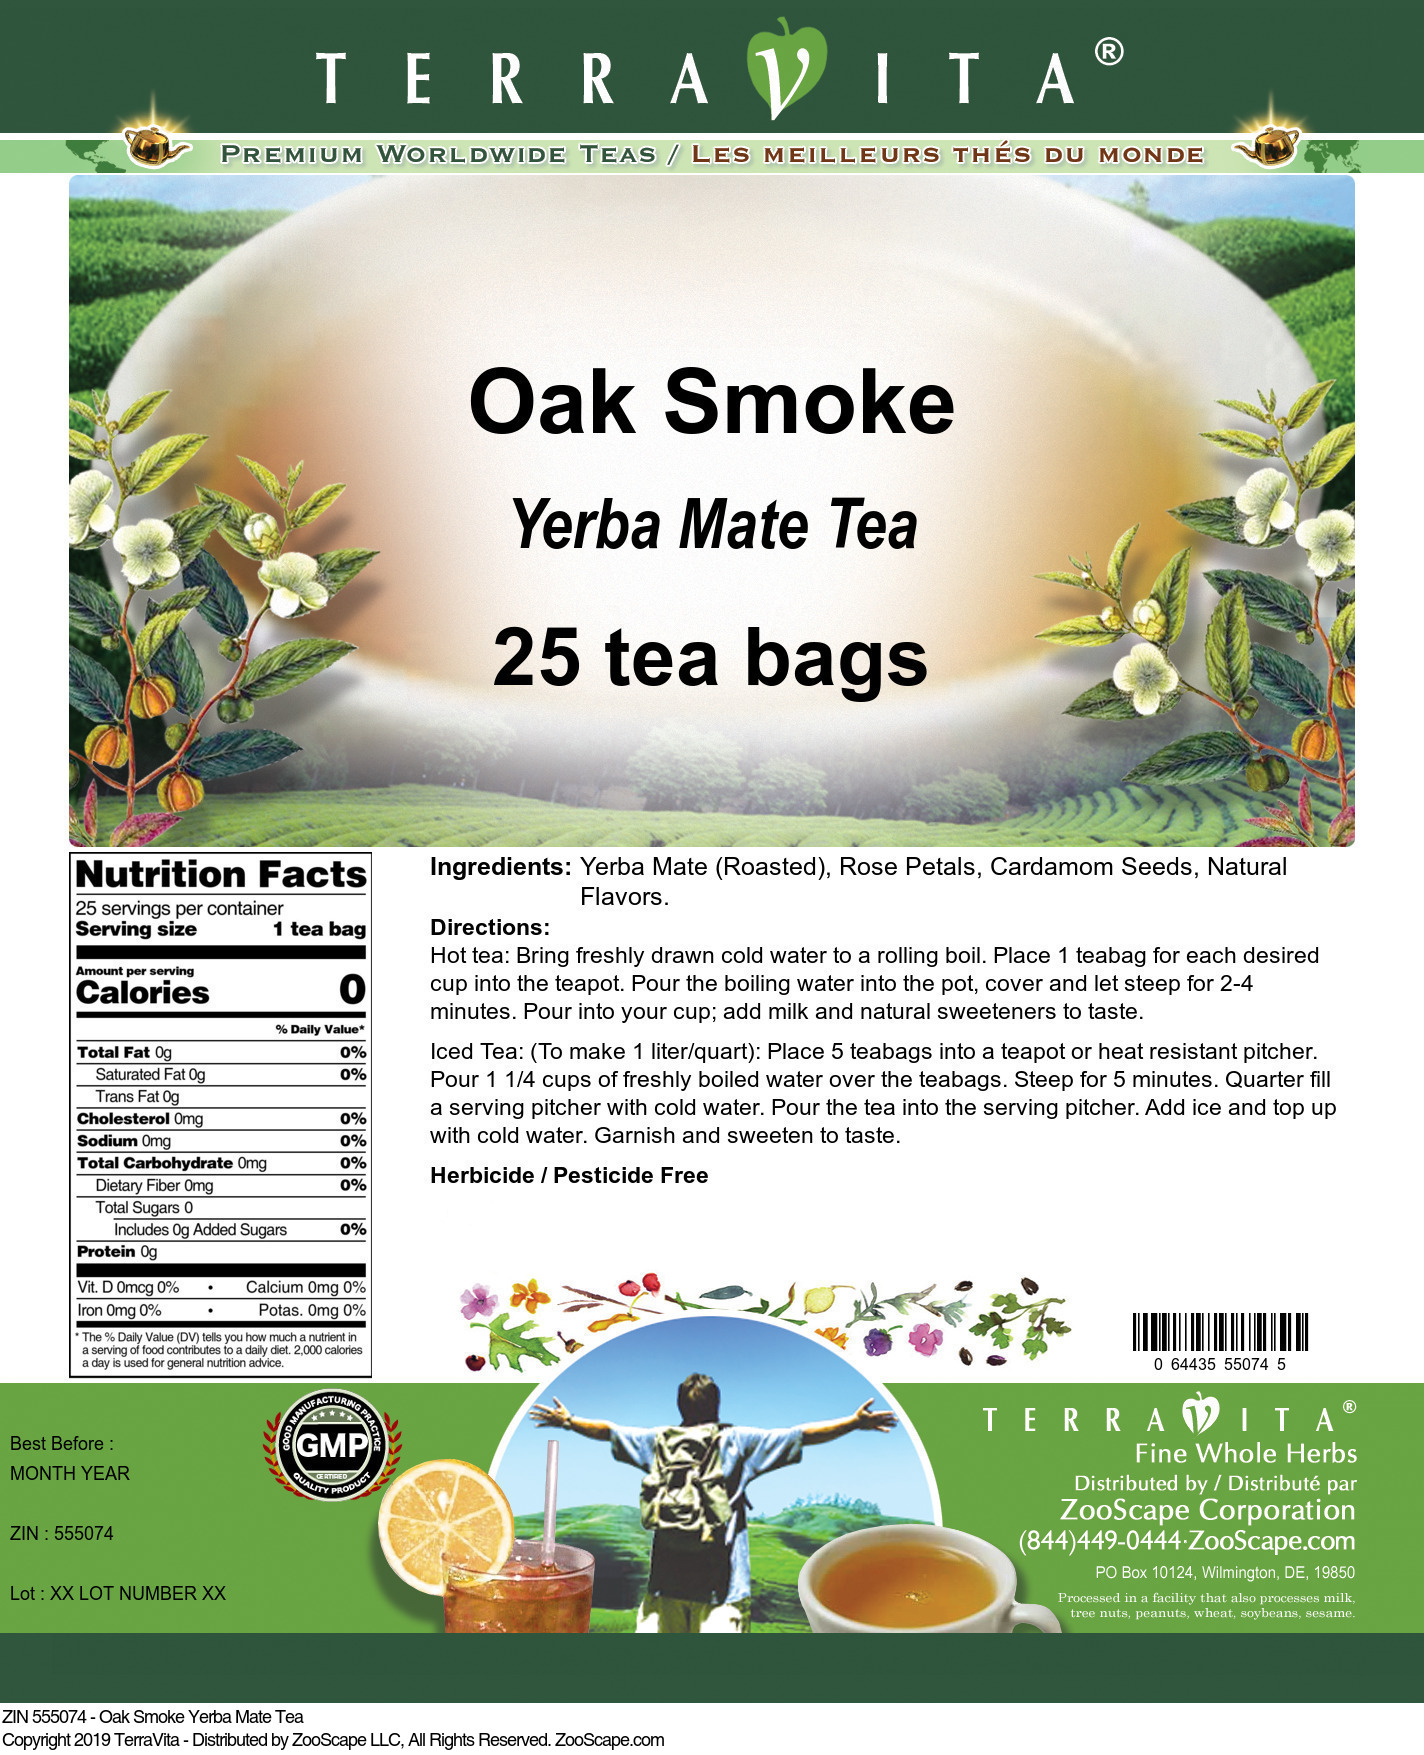 Oak Smoke Yerba Mate Tea